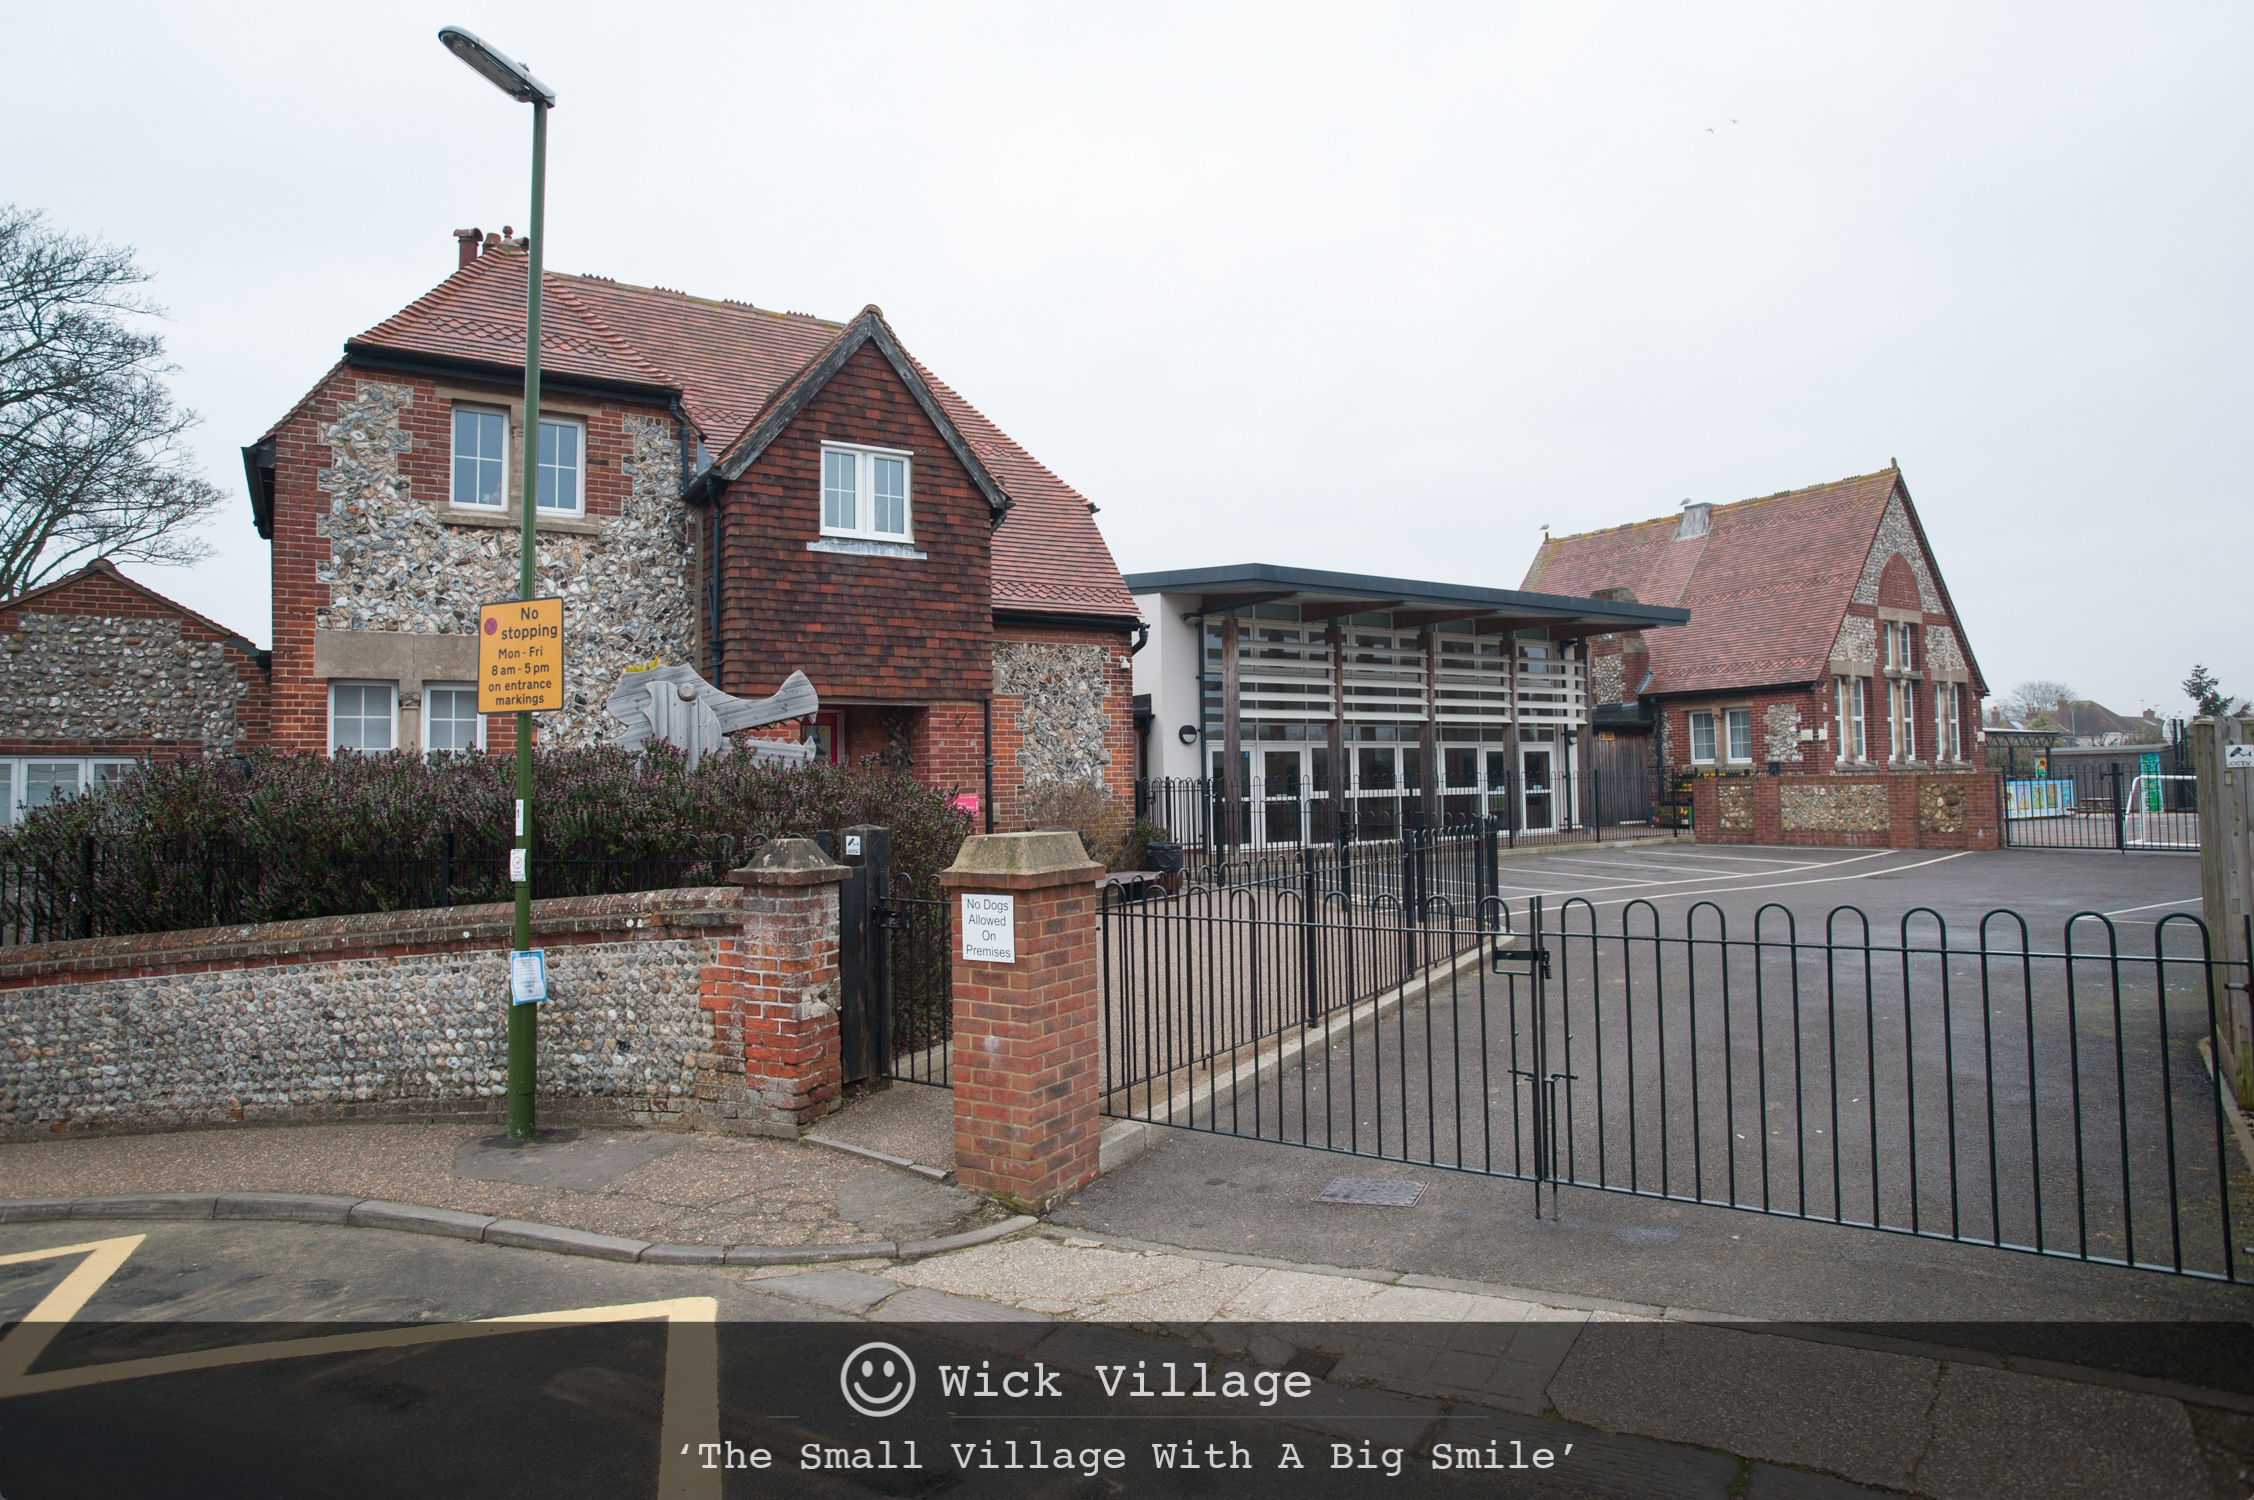 Lyminster Primary School, Wick Village, Littlehampton.